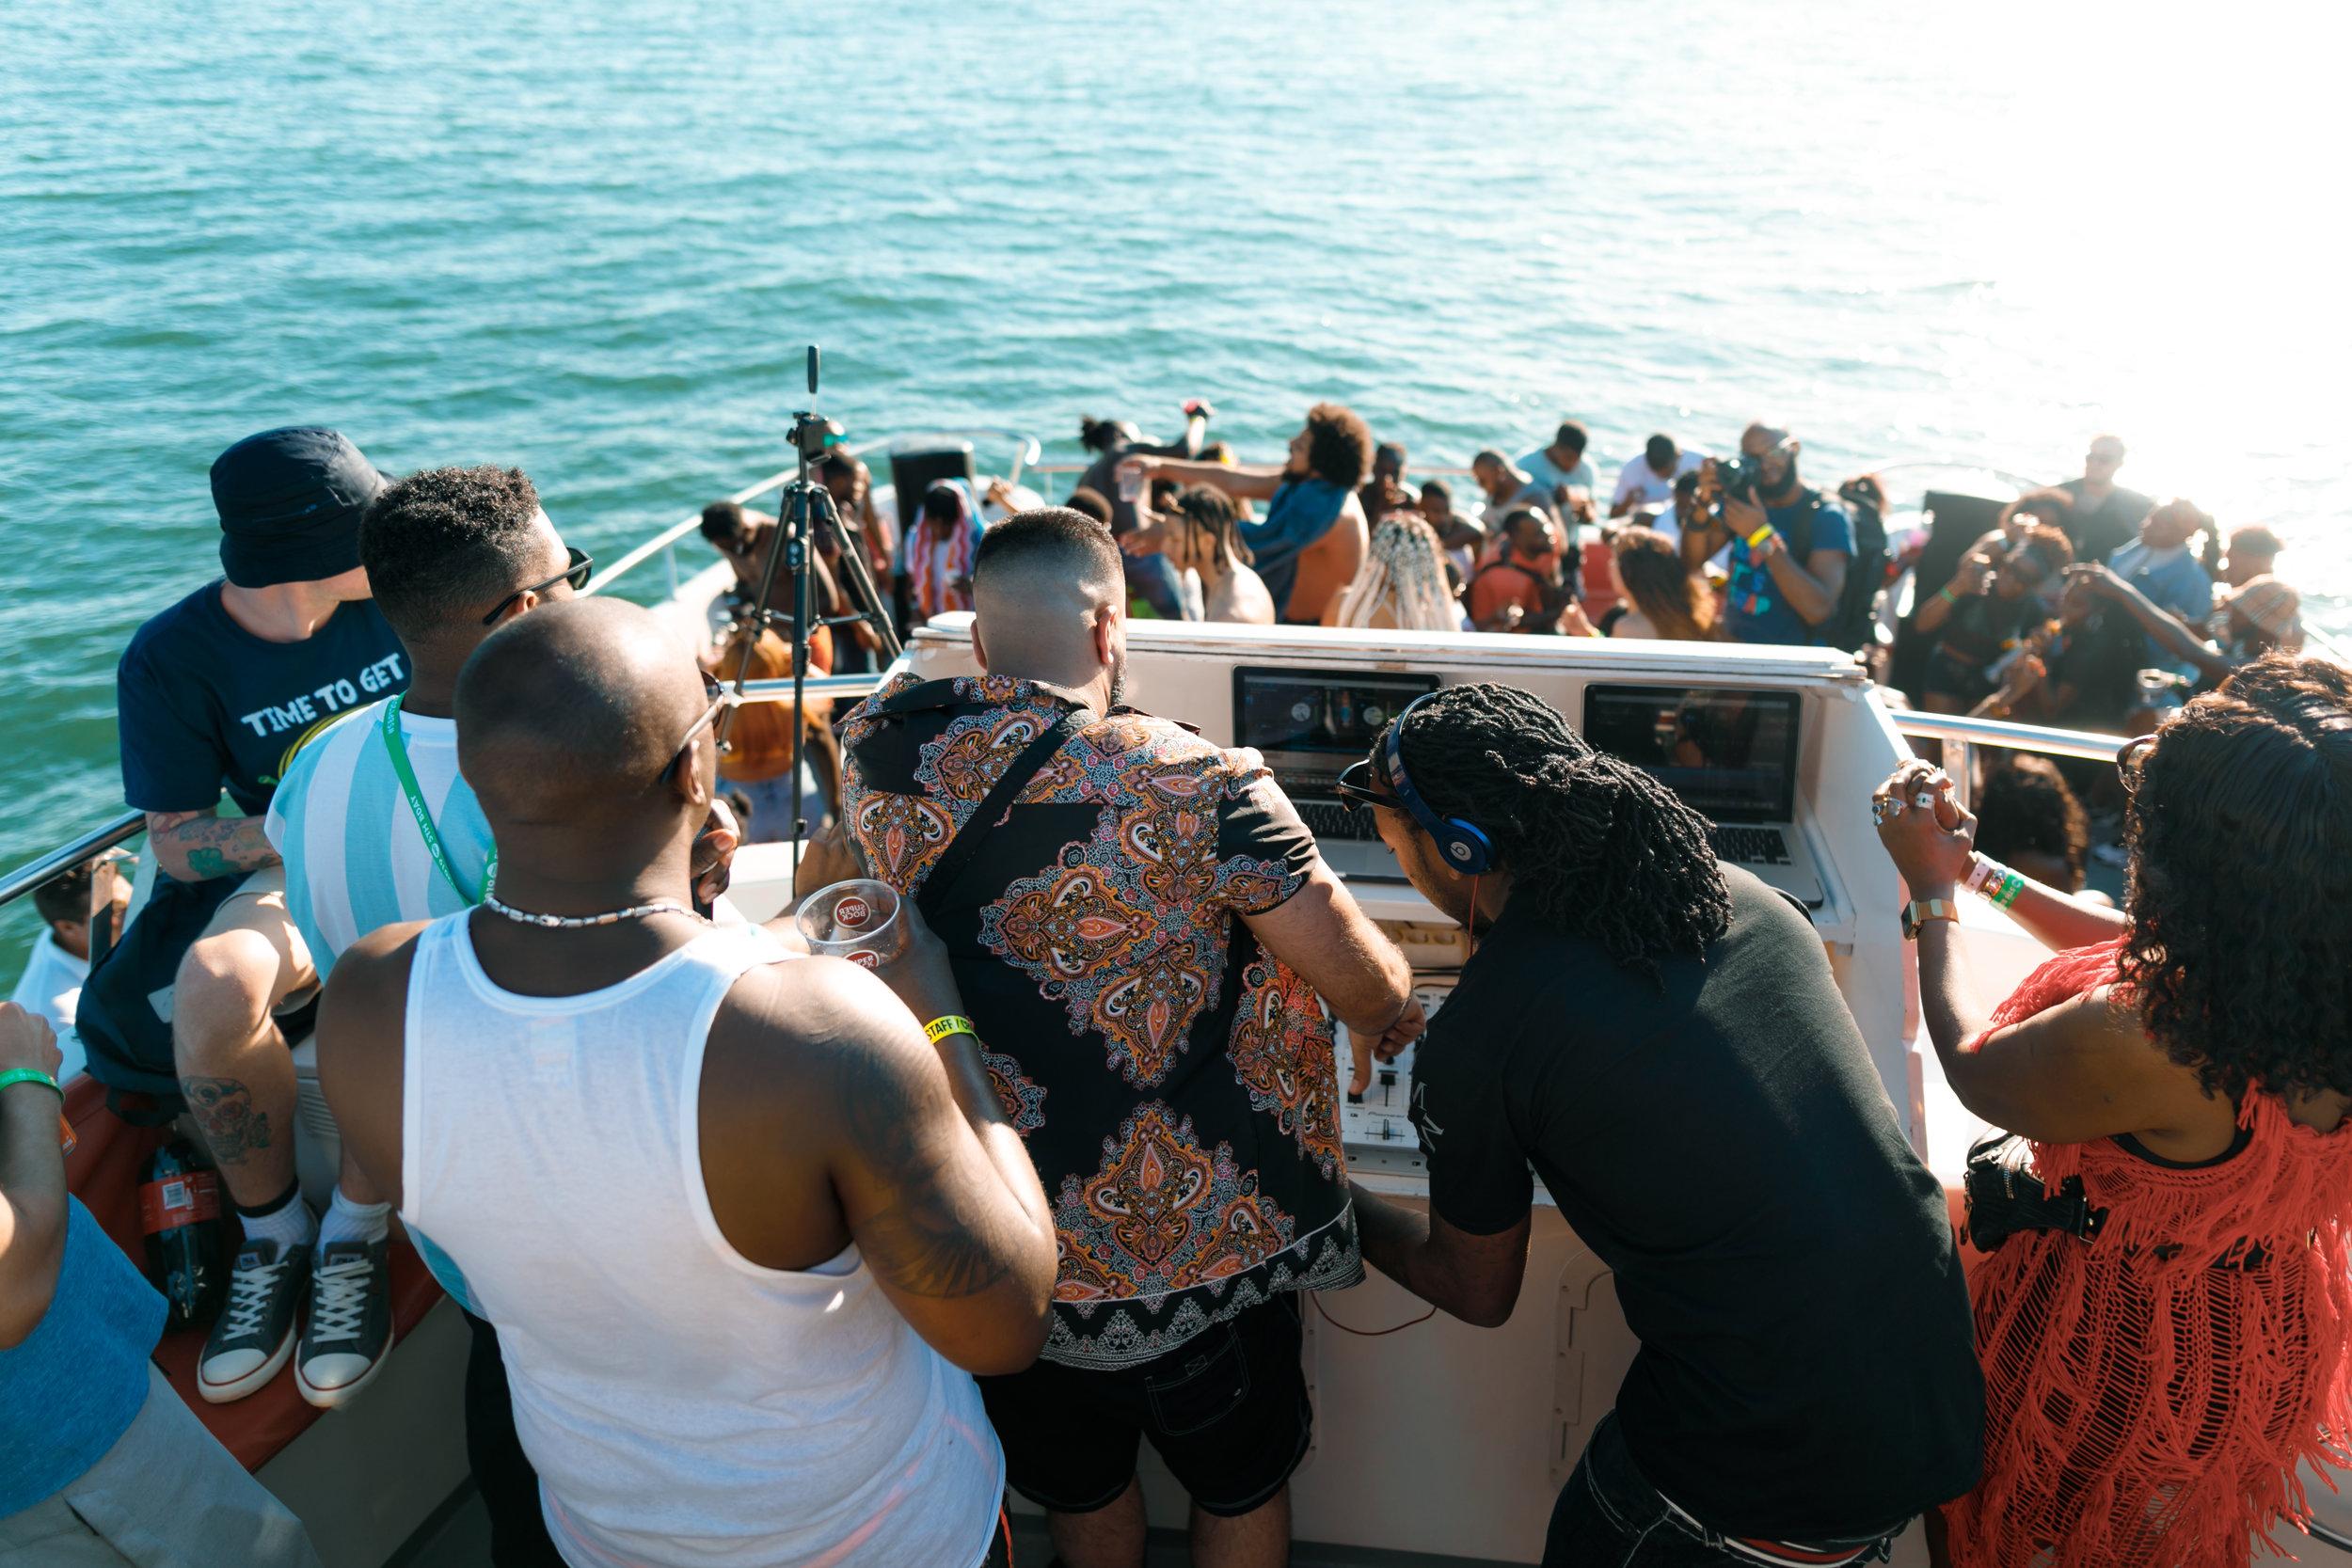 TropiCool Boat Party - SUN, SEA & VIBES!